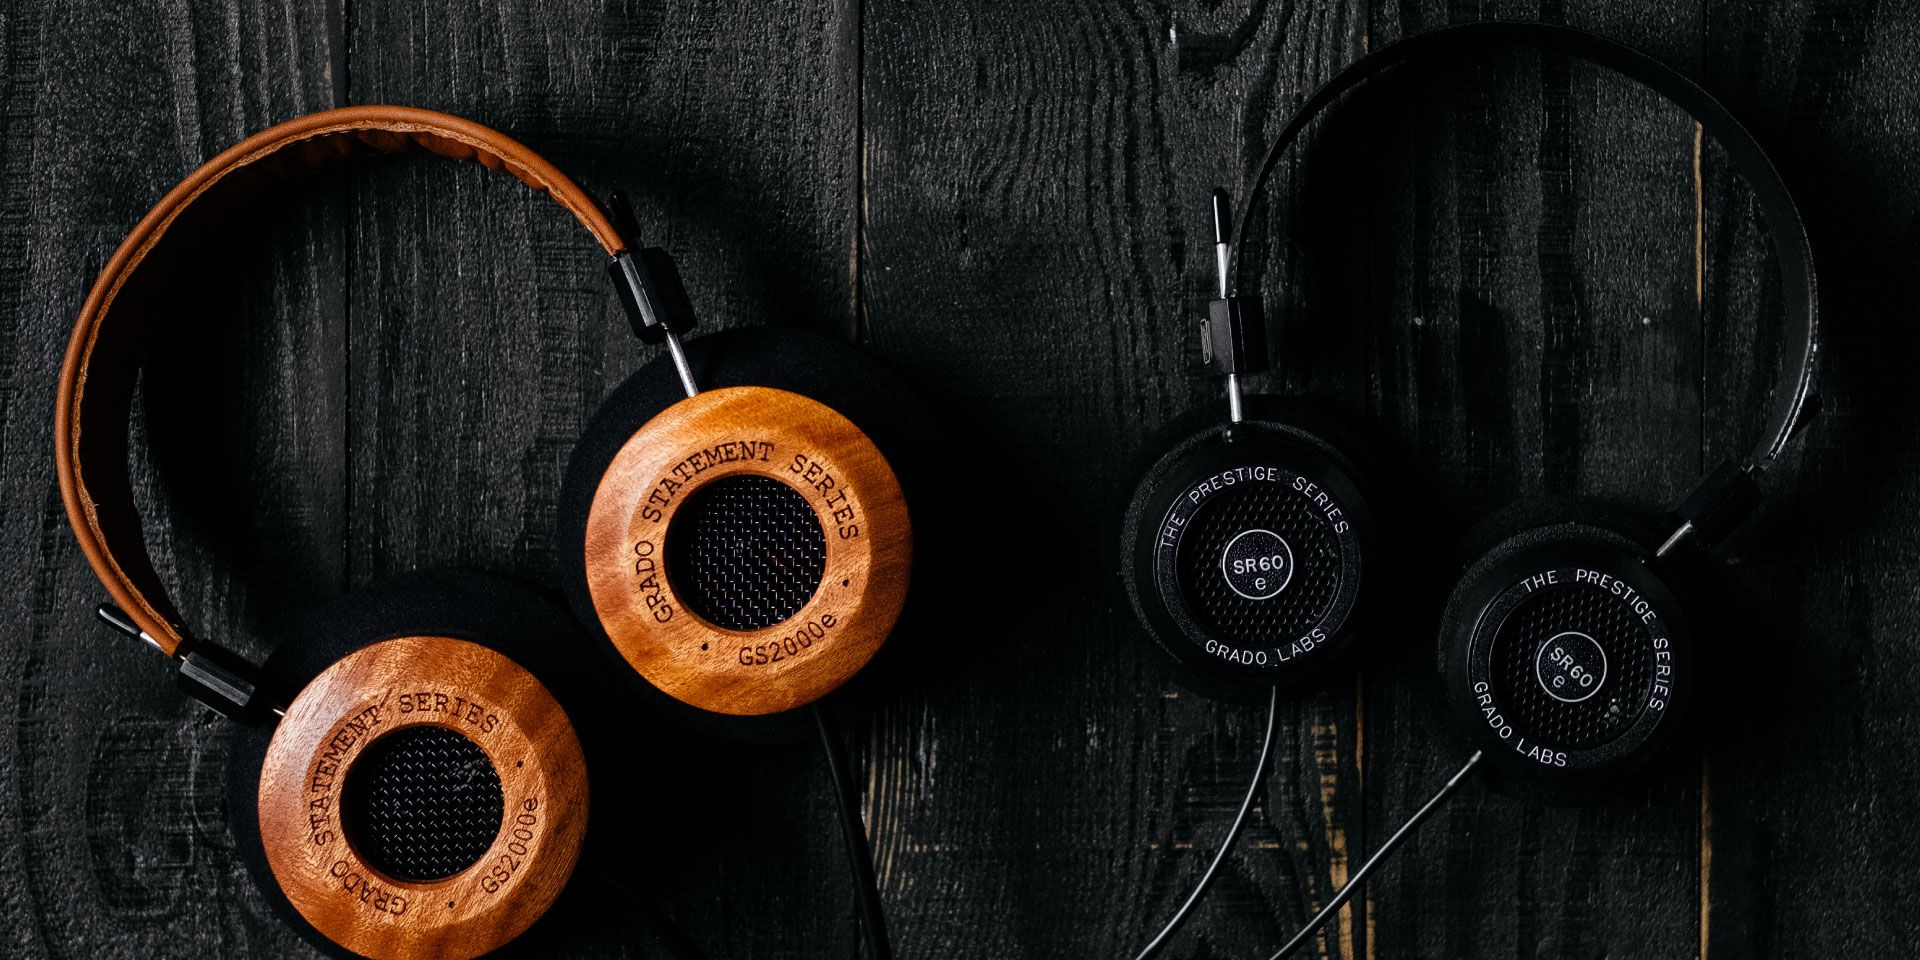 Headphones (With images) Headphones, Grado labs, Grado